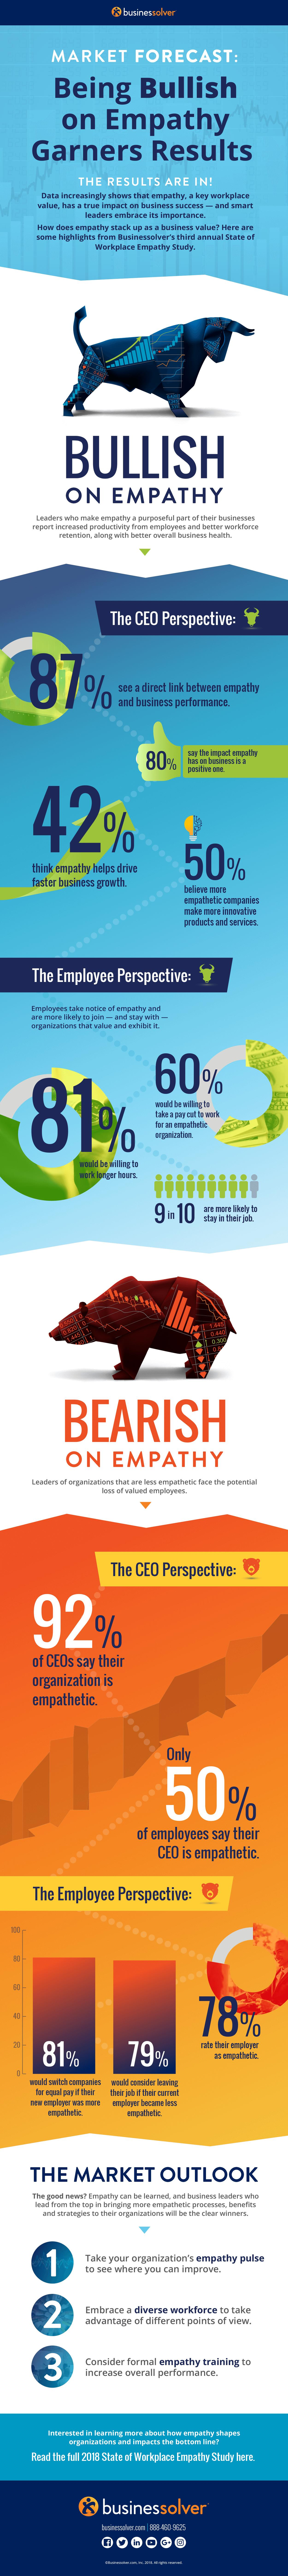 businessolver-empathy-infographic-bullish-vs-bearish